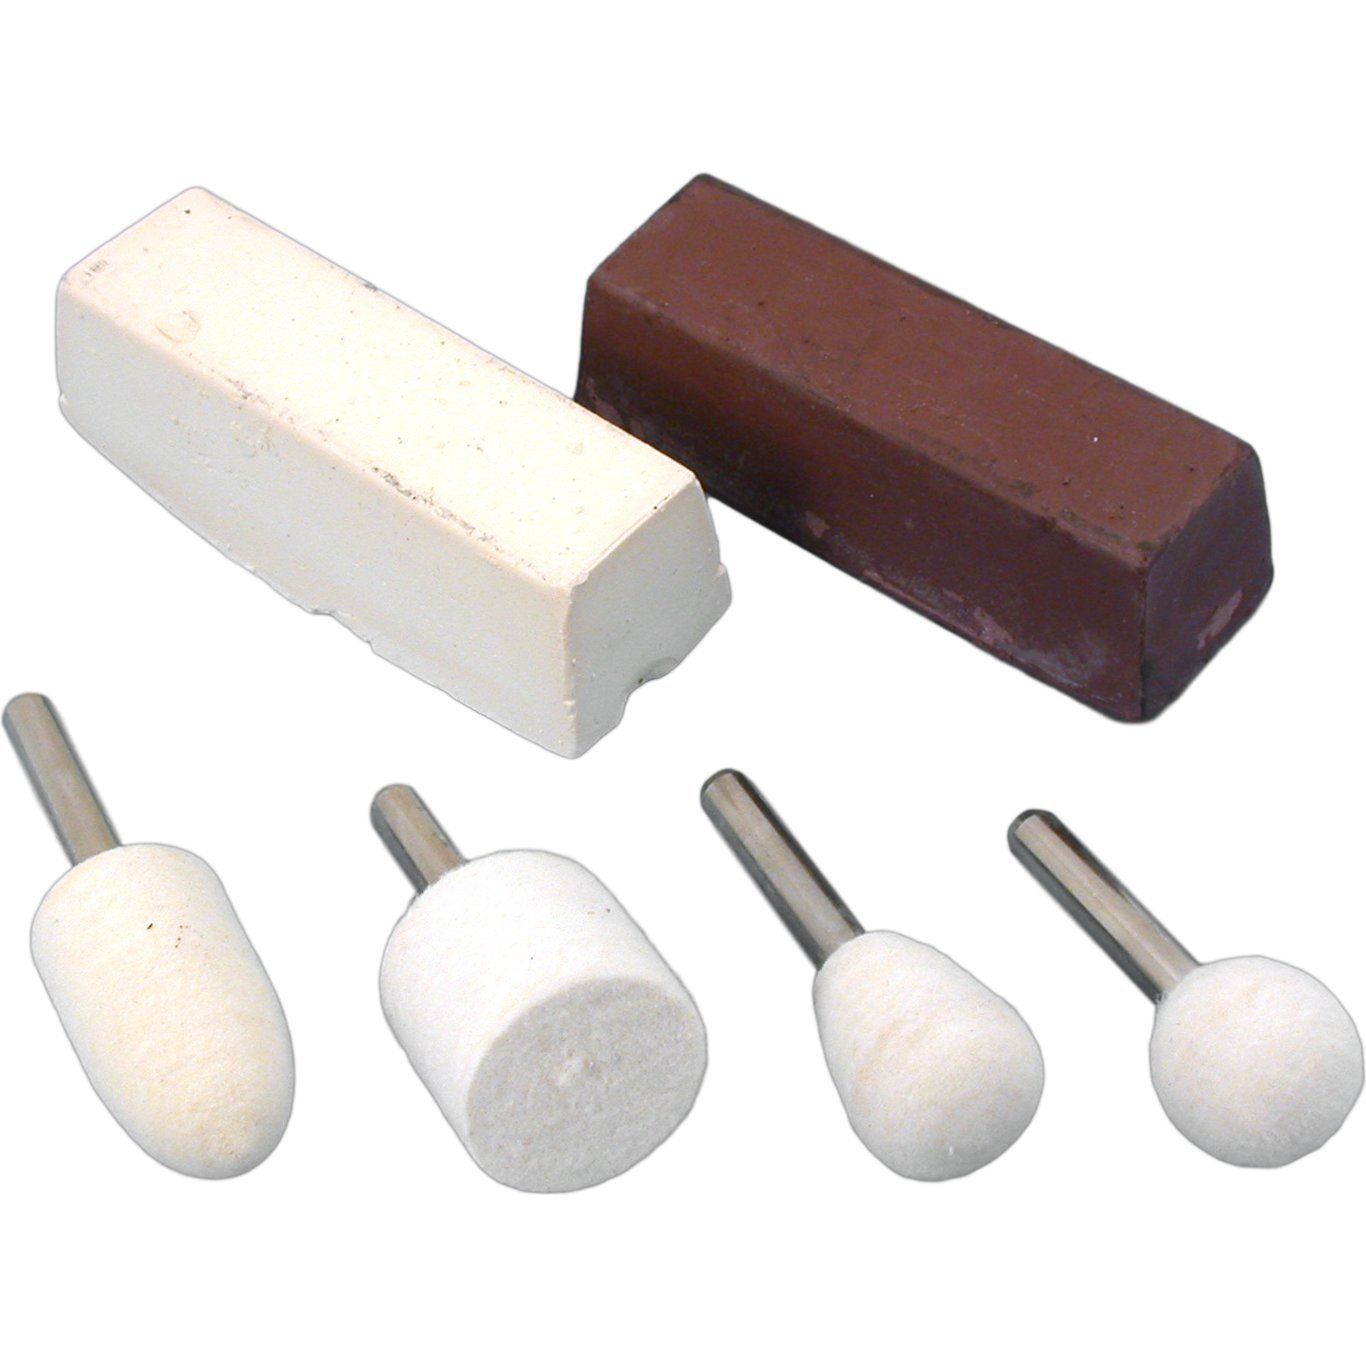 4 Felt Buffs Rouges Jewelers Polishing Rotary Tools